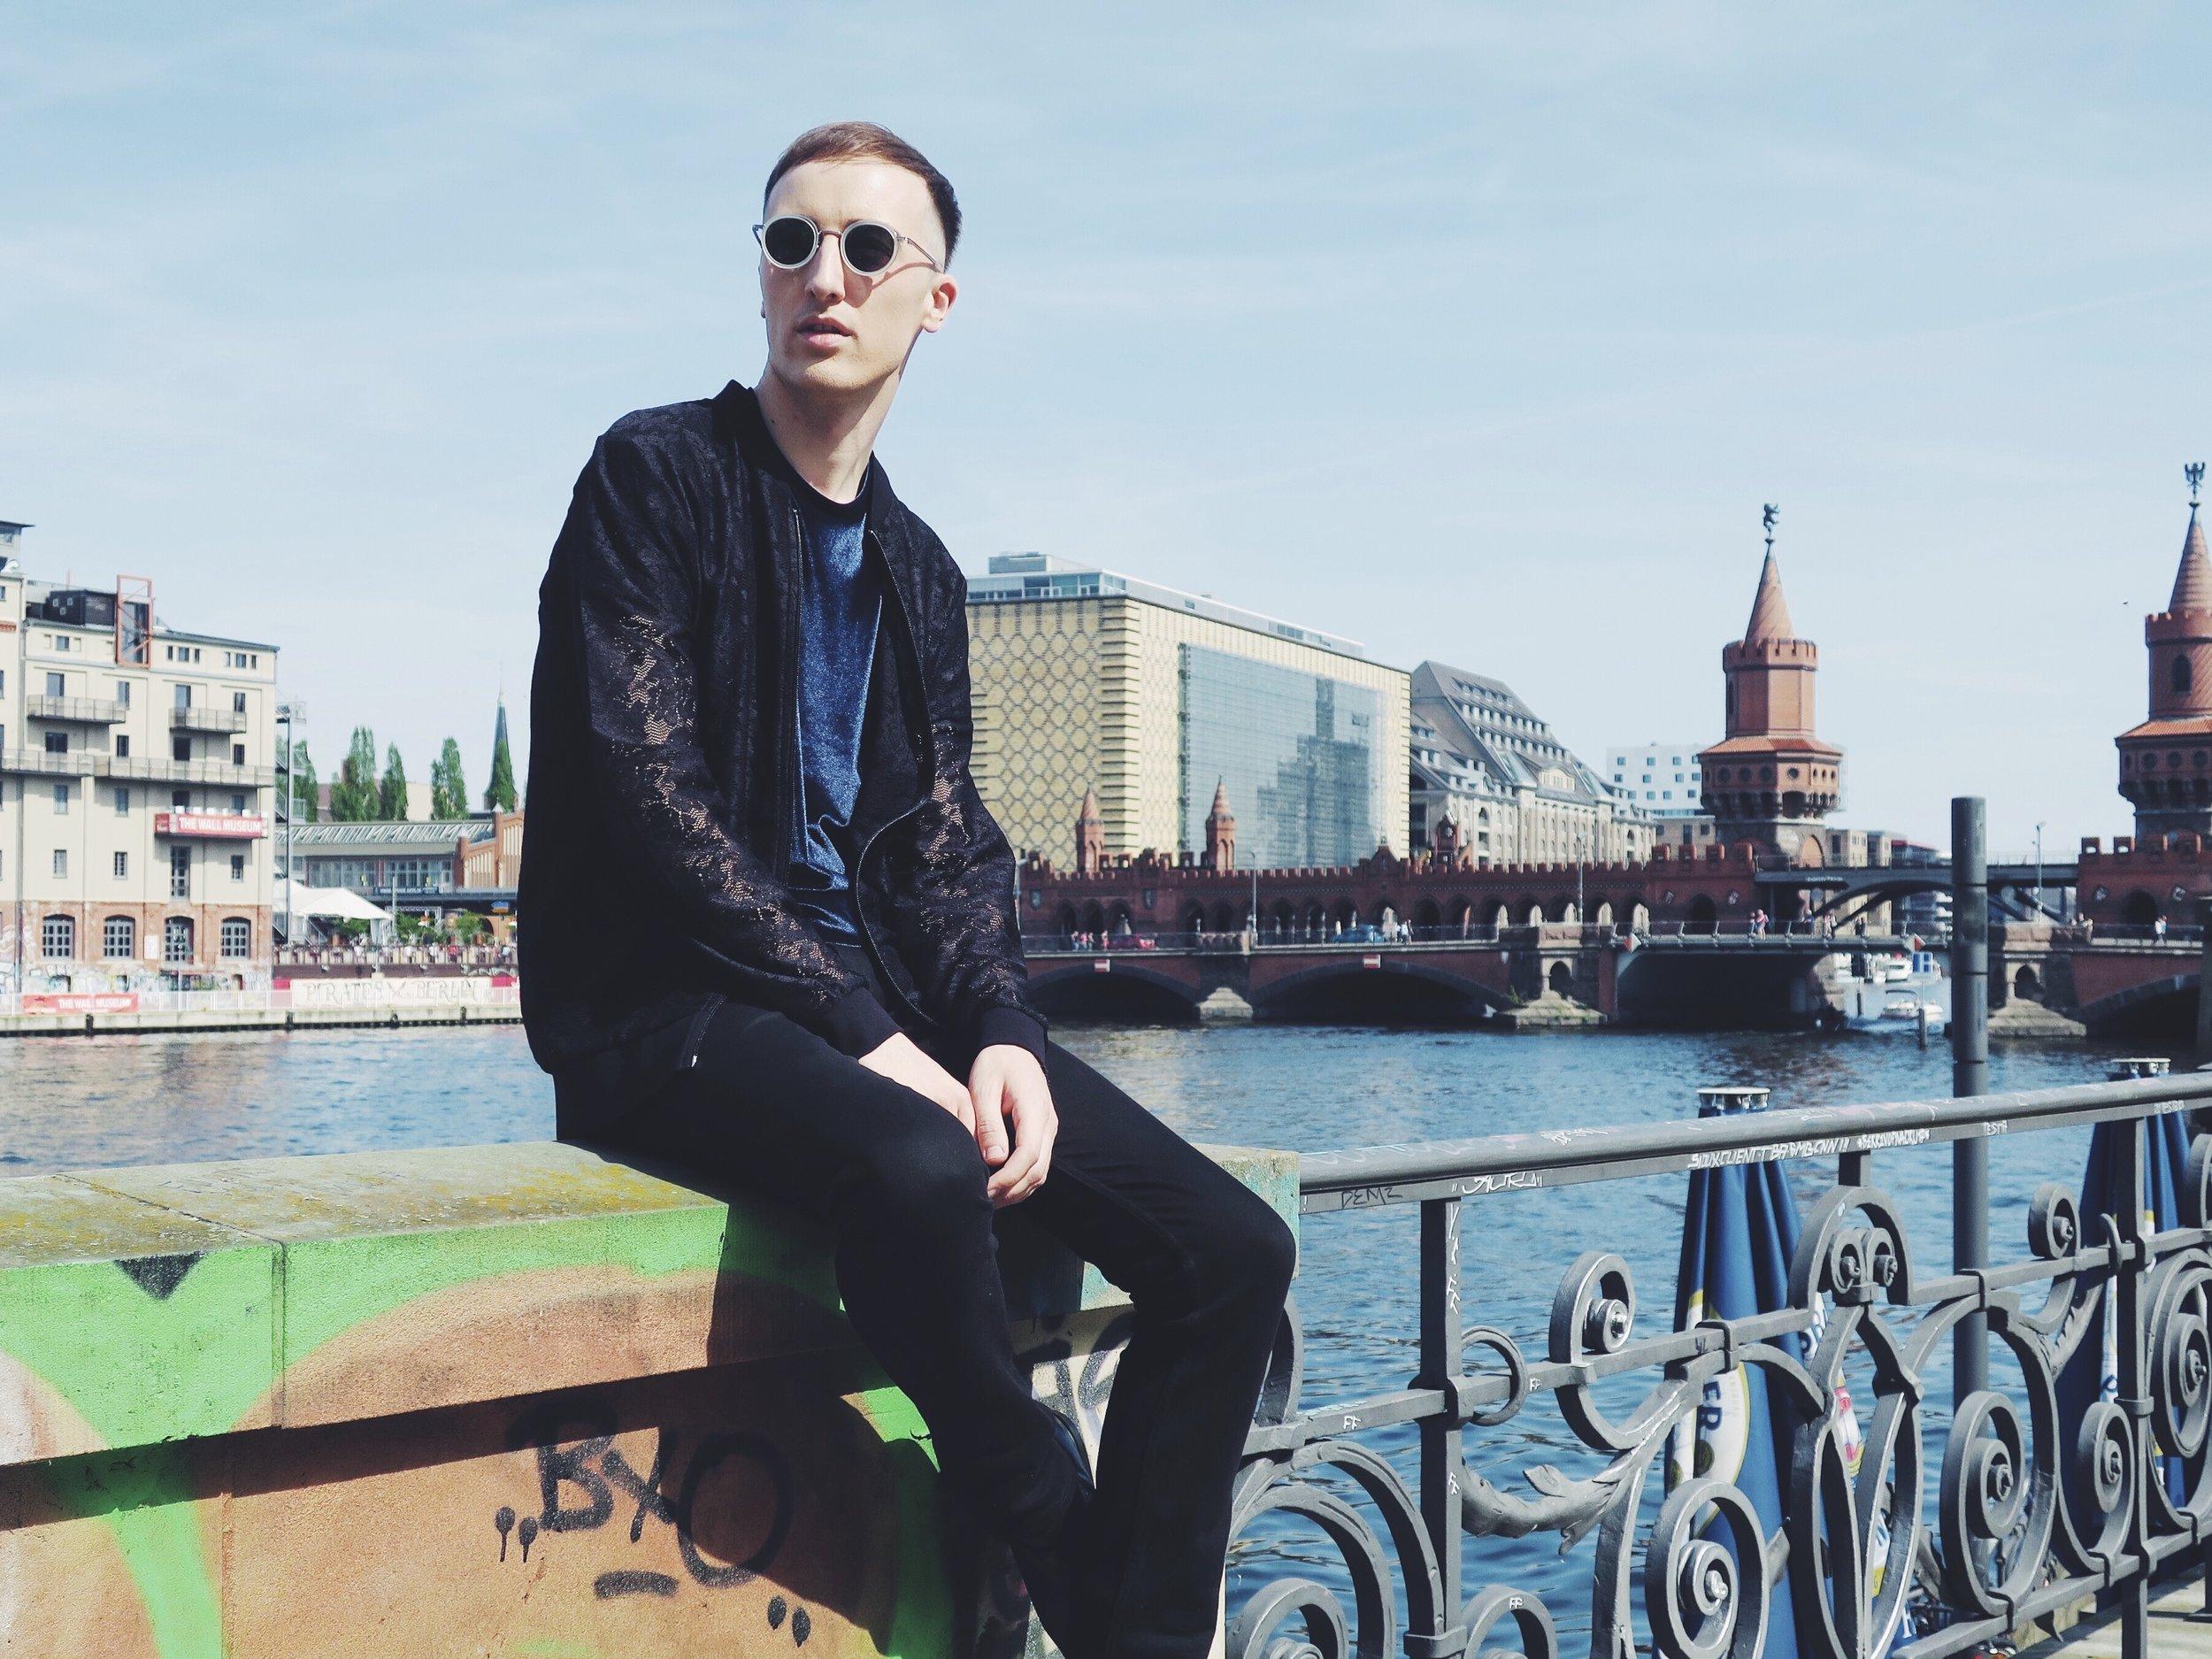 Asos bomber jacket - Asos t-shirt - Calvin Klein Jeans trousers - Komono sunglasses